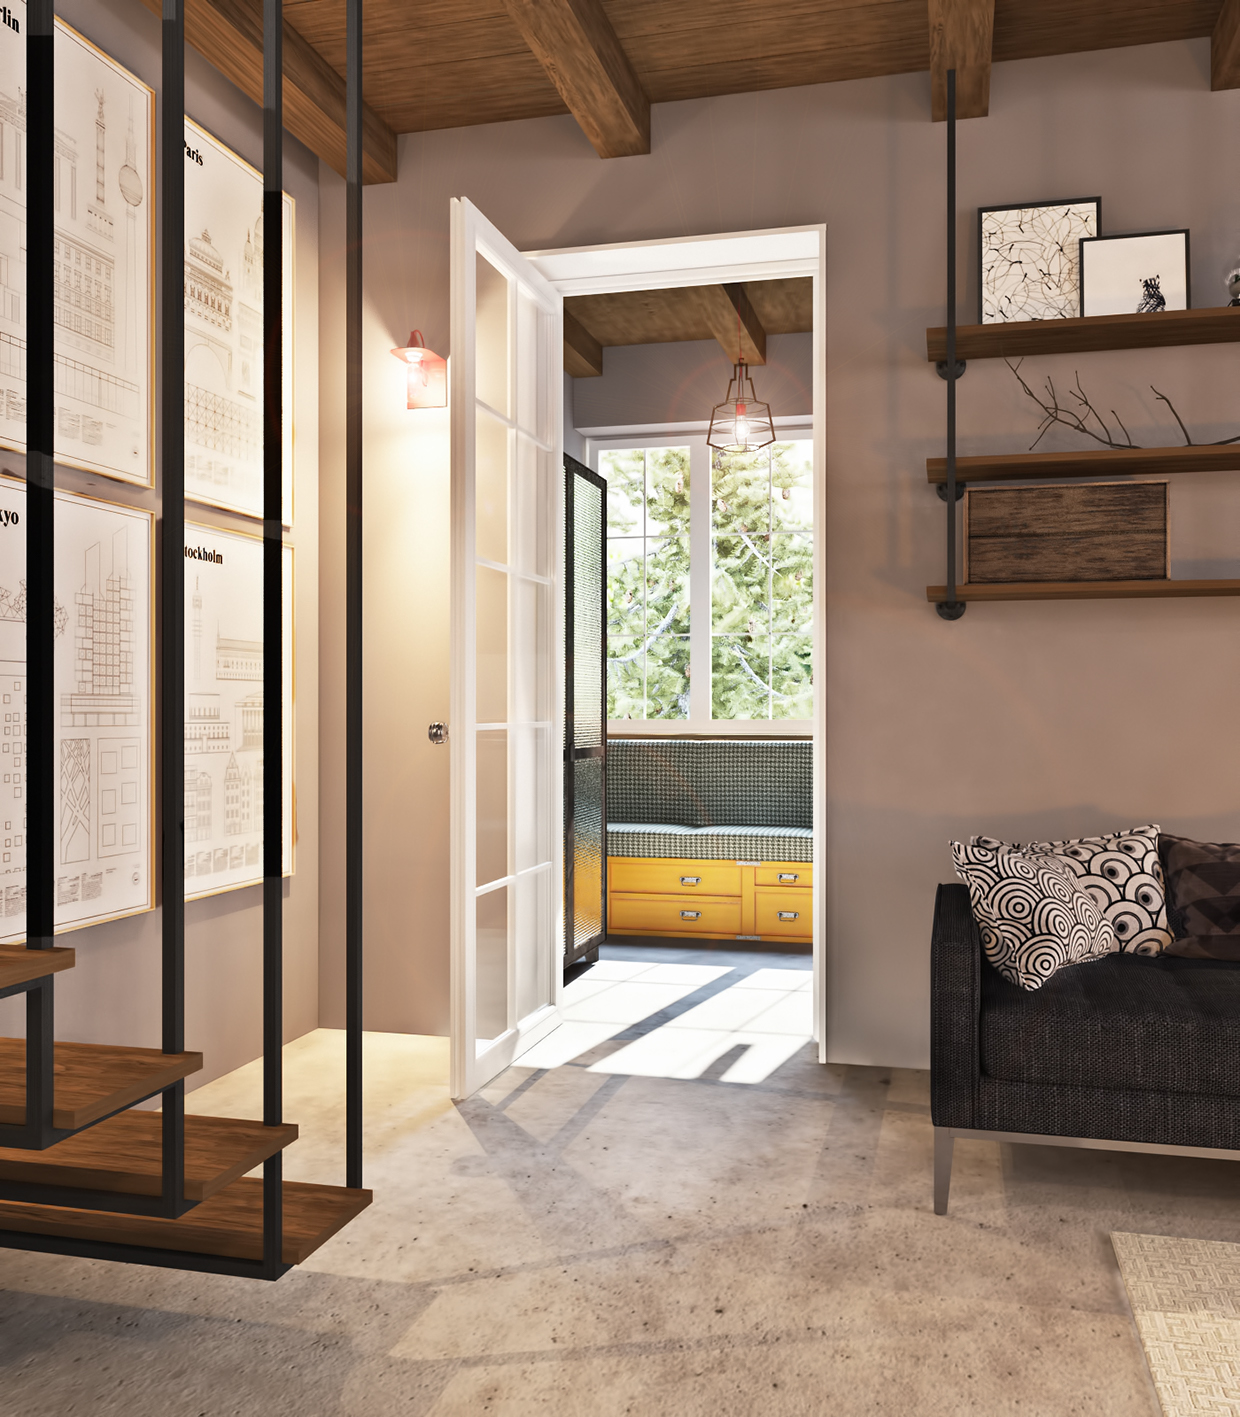 studio apartment with industrial decor